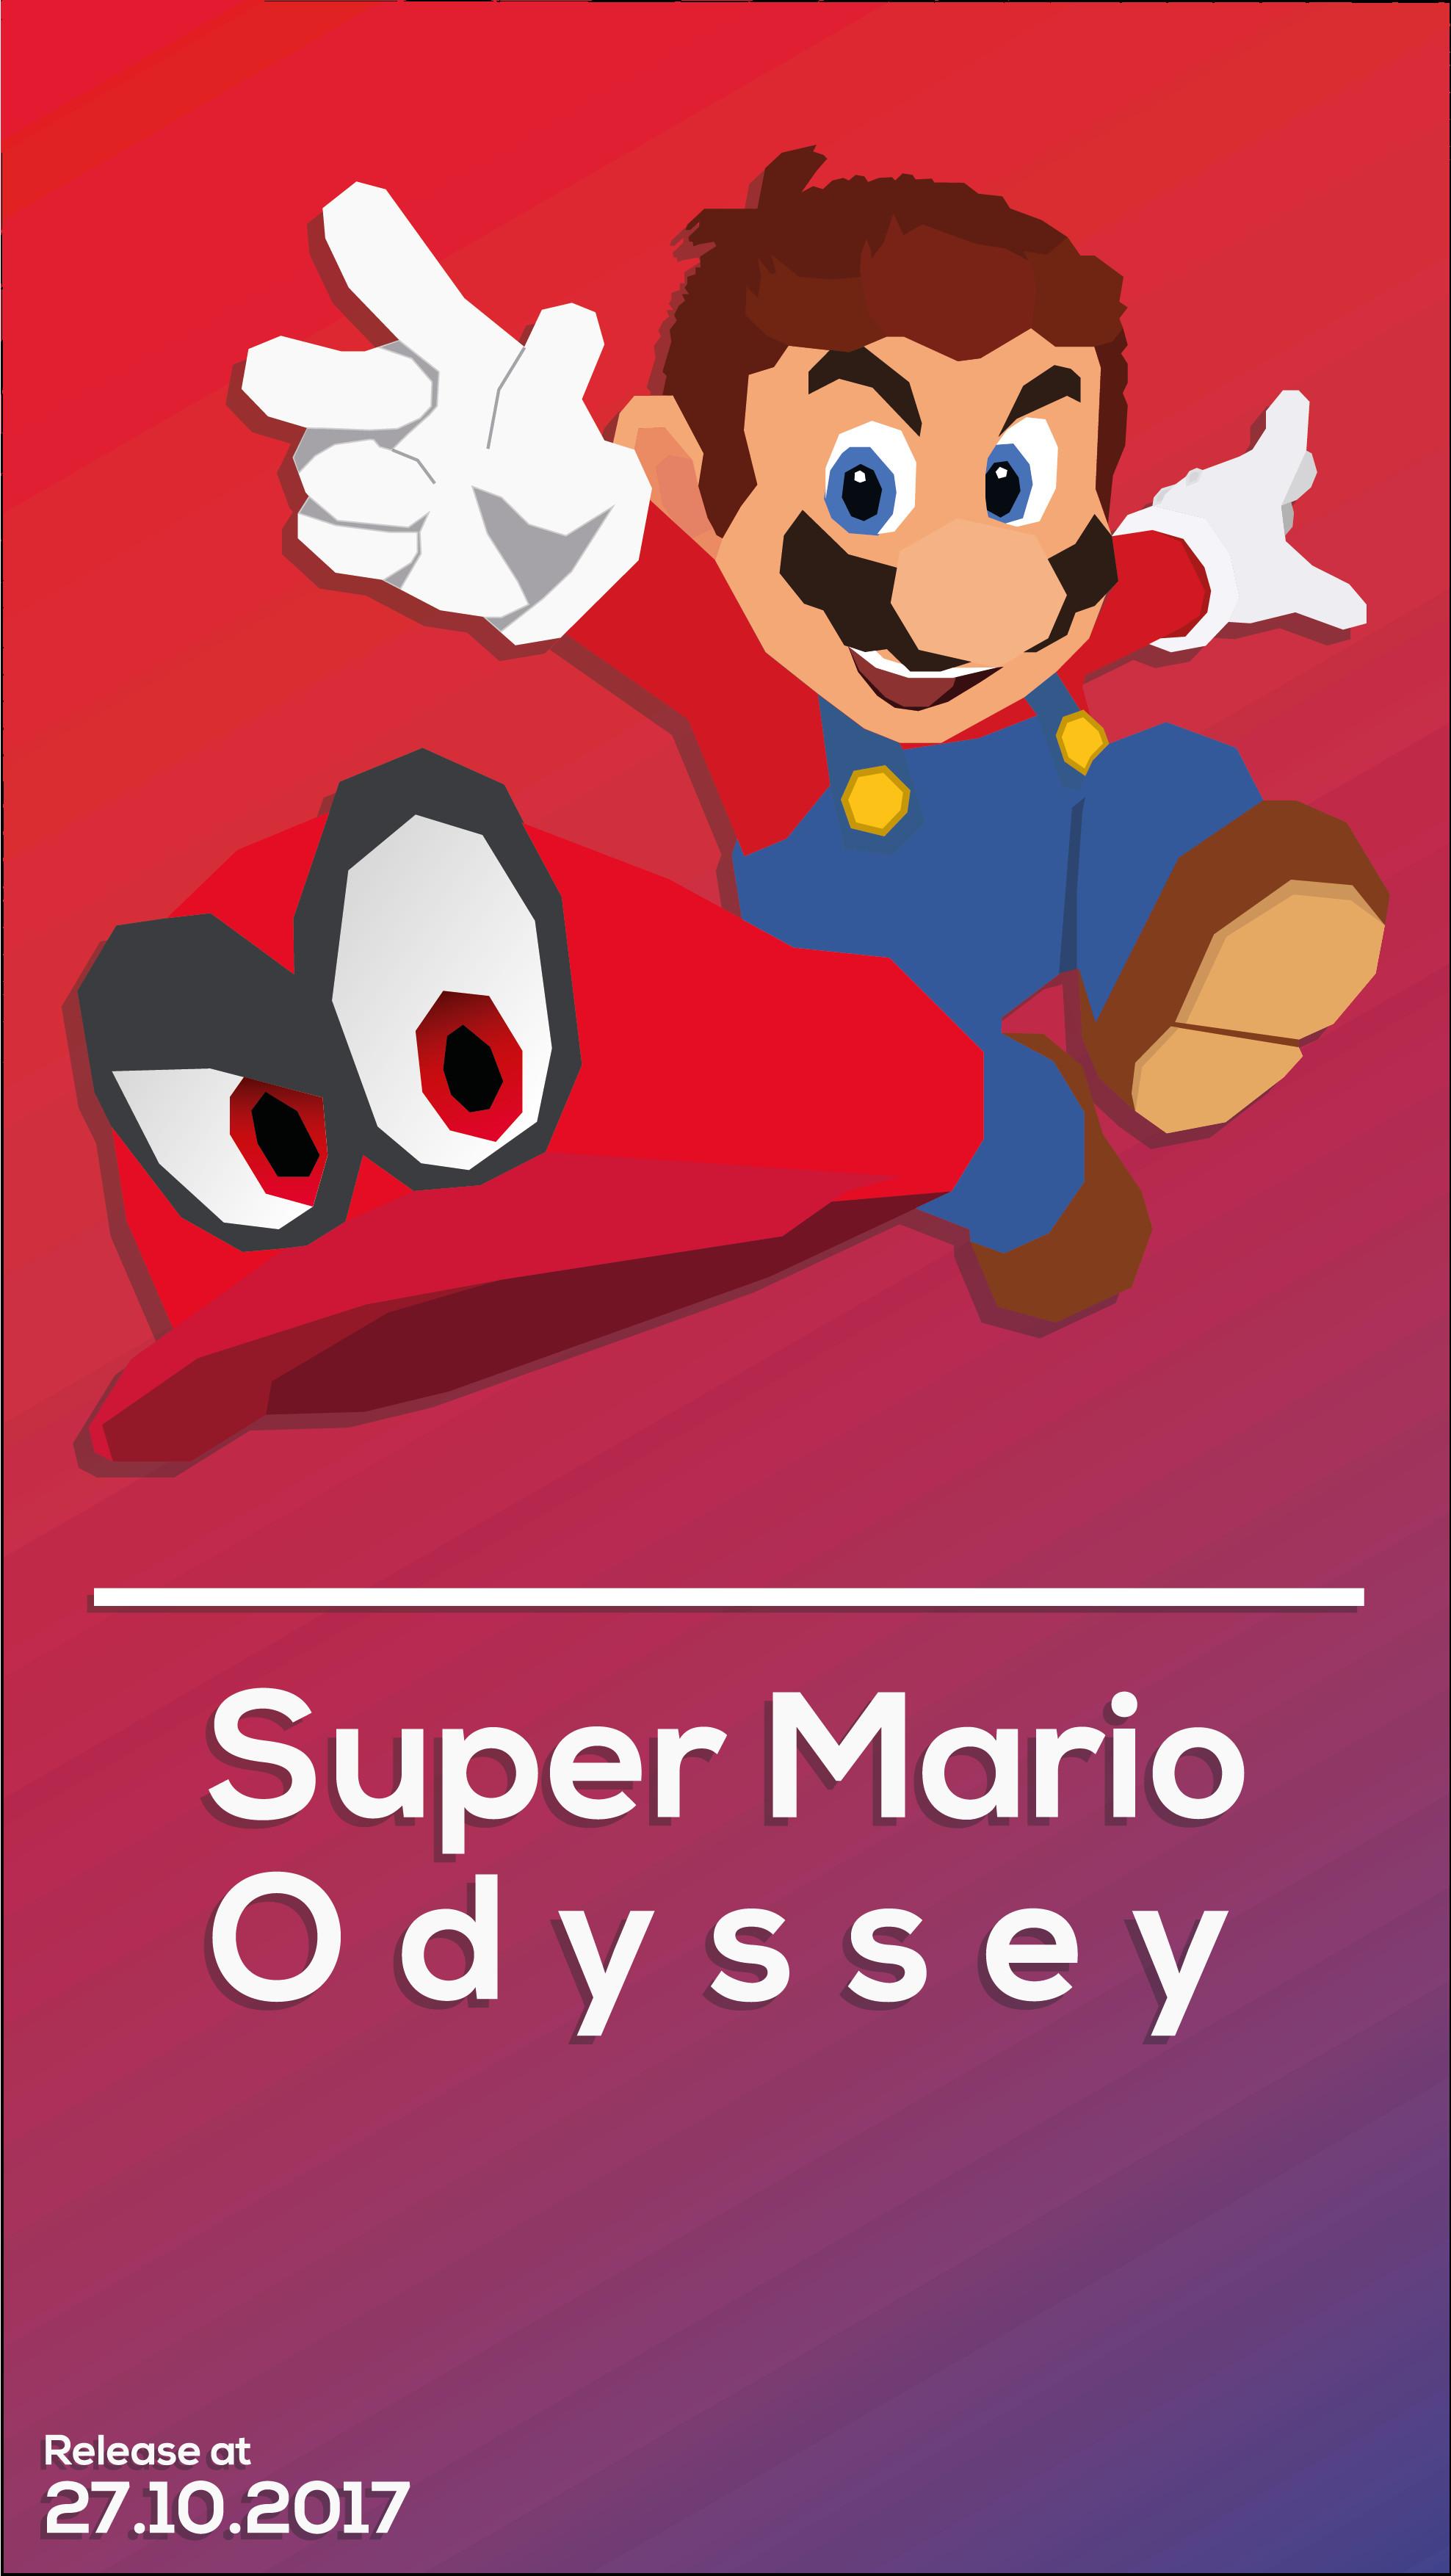 Super Mario Phone Wallpaper 77 Images